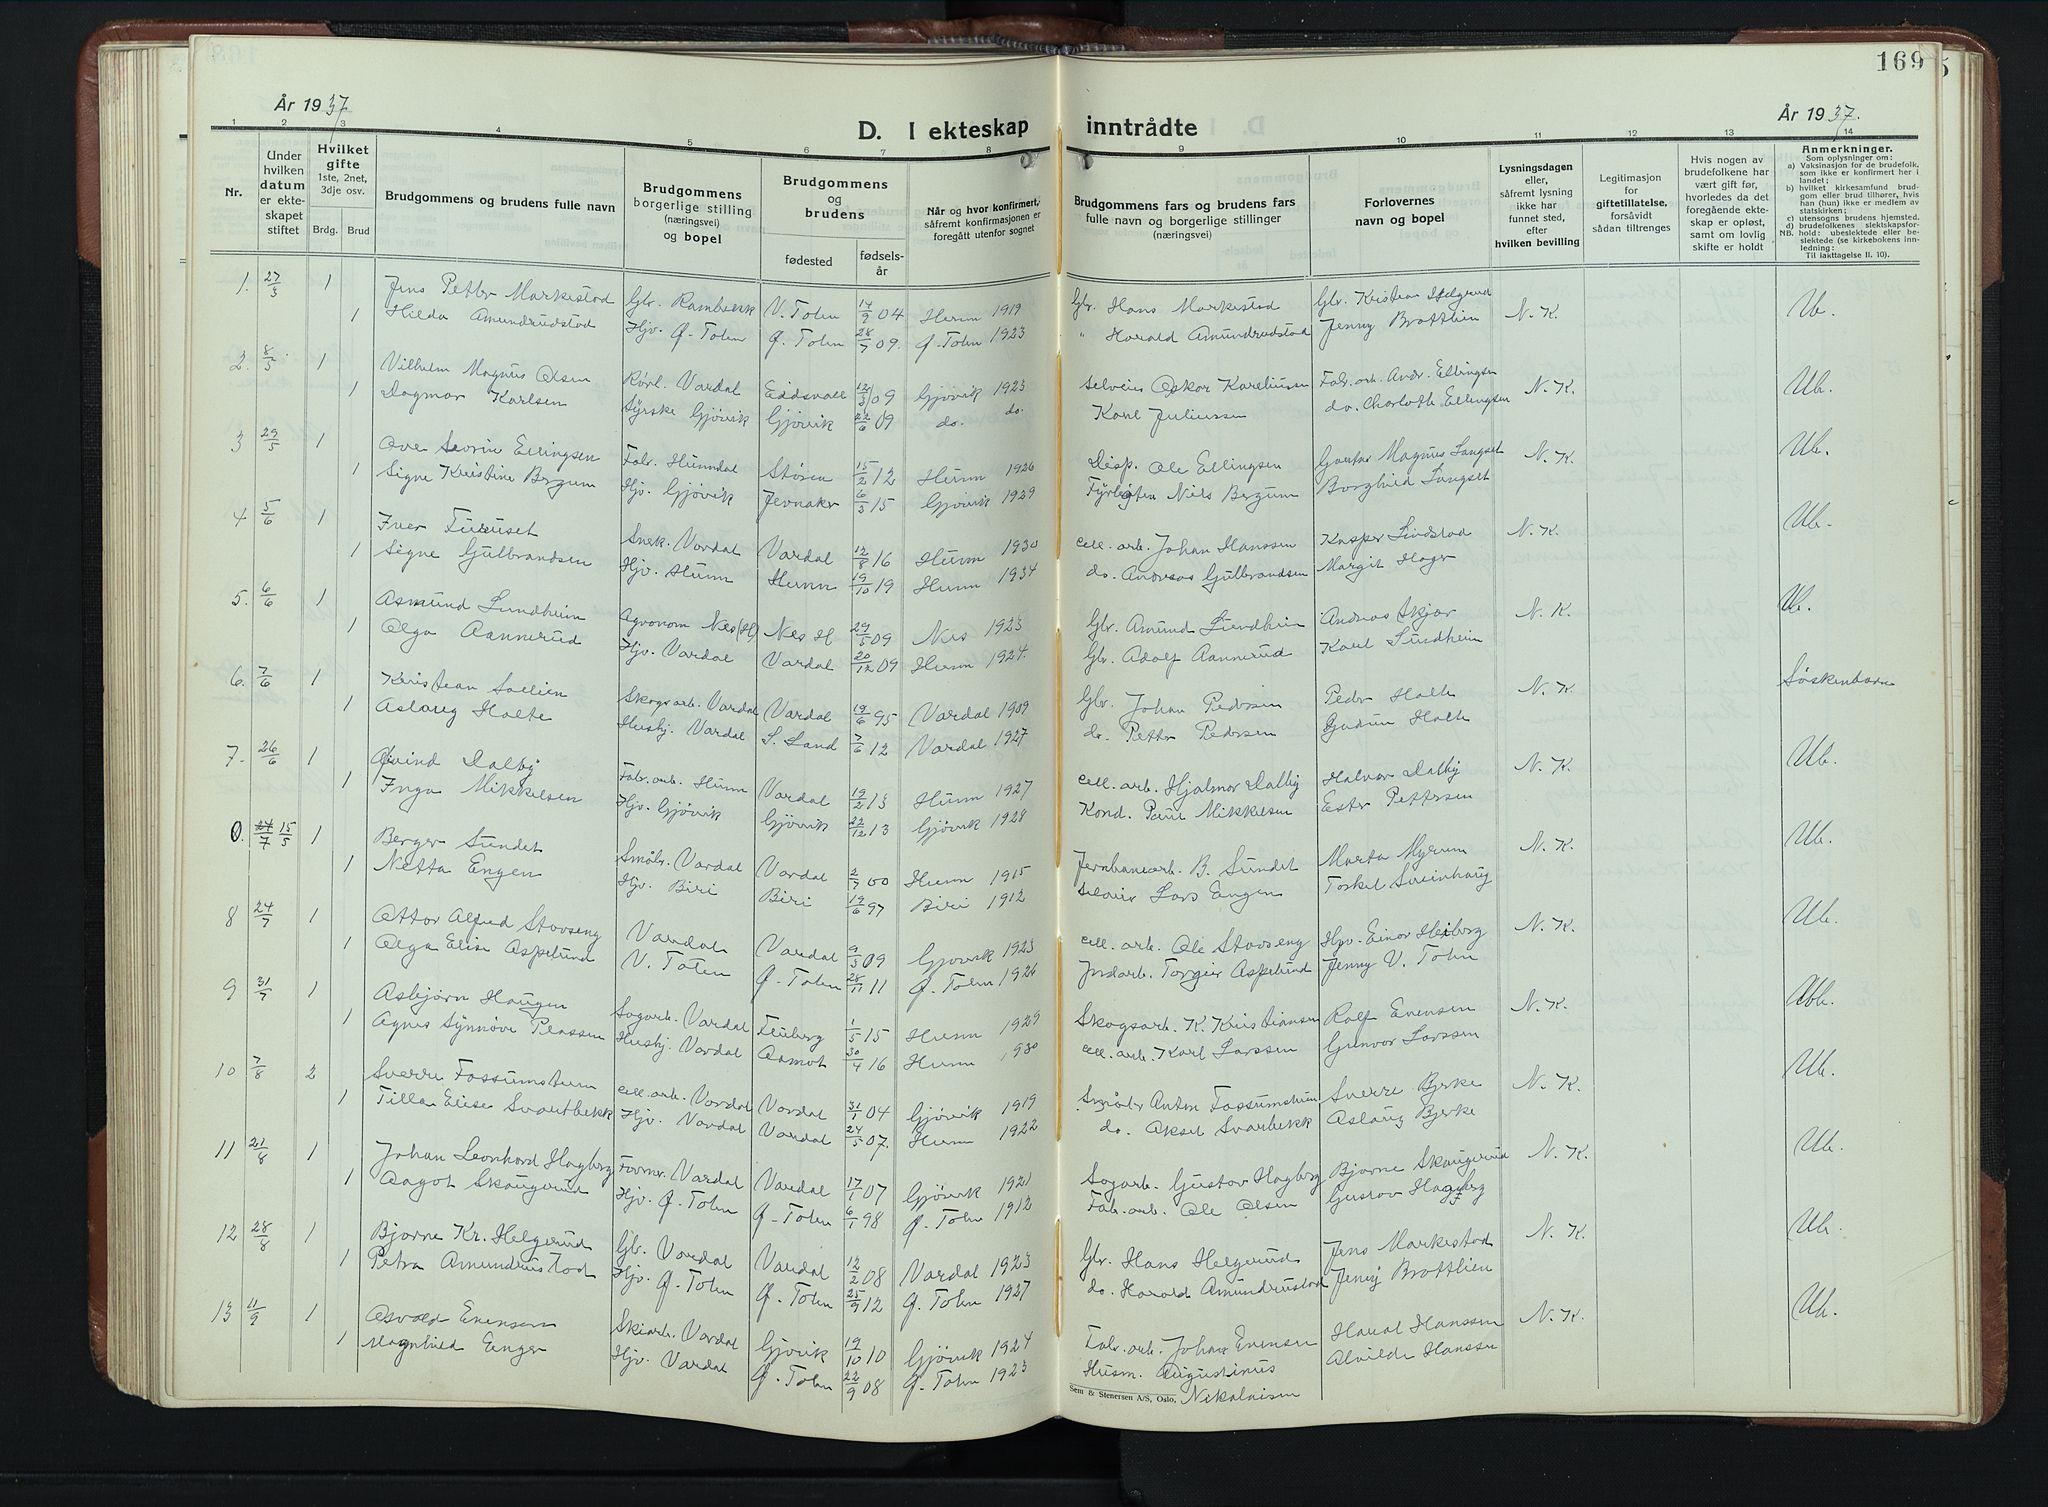 SAH, Vardal prestekontor, H/Ha/Hab/L0023: Klokkerbok nr. 23, 1929-1941, s. 169